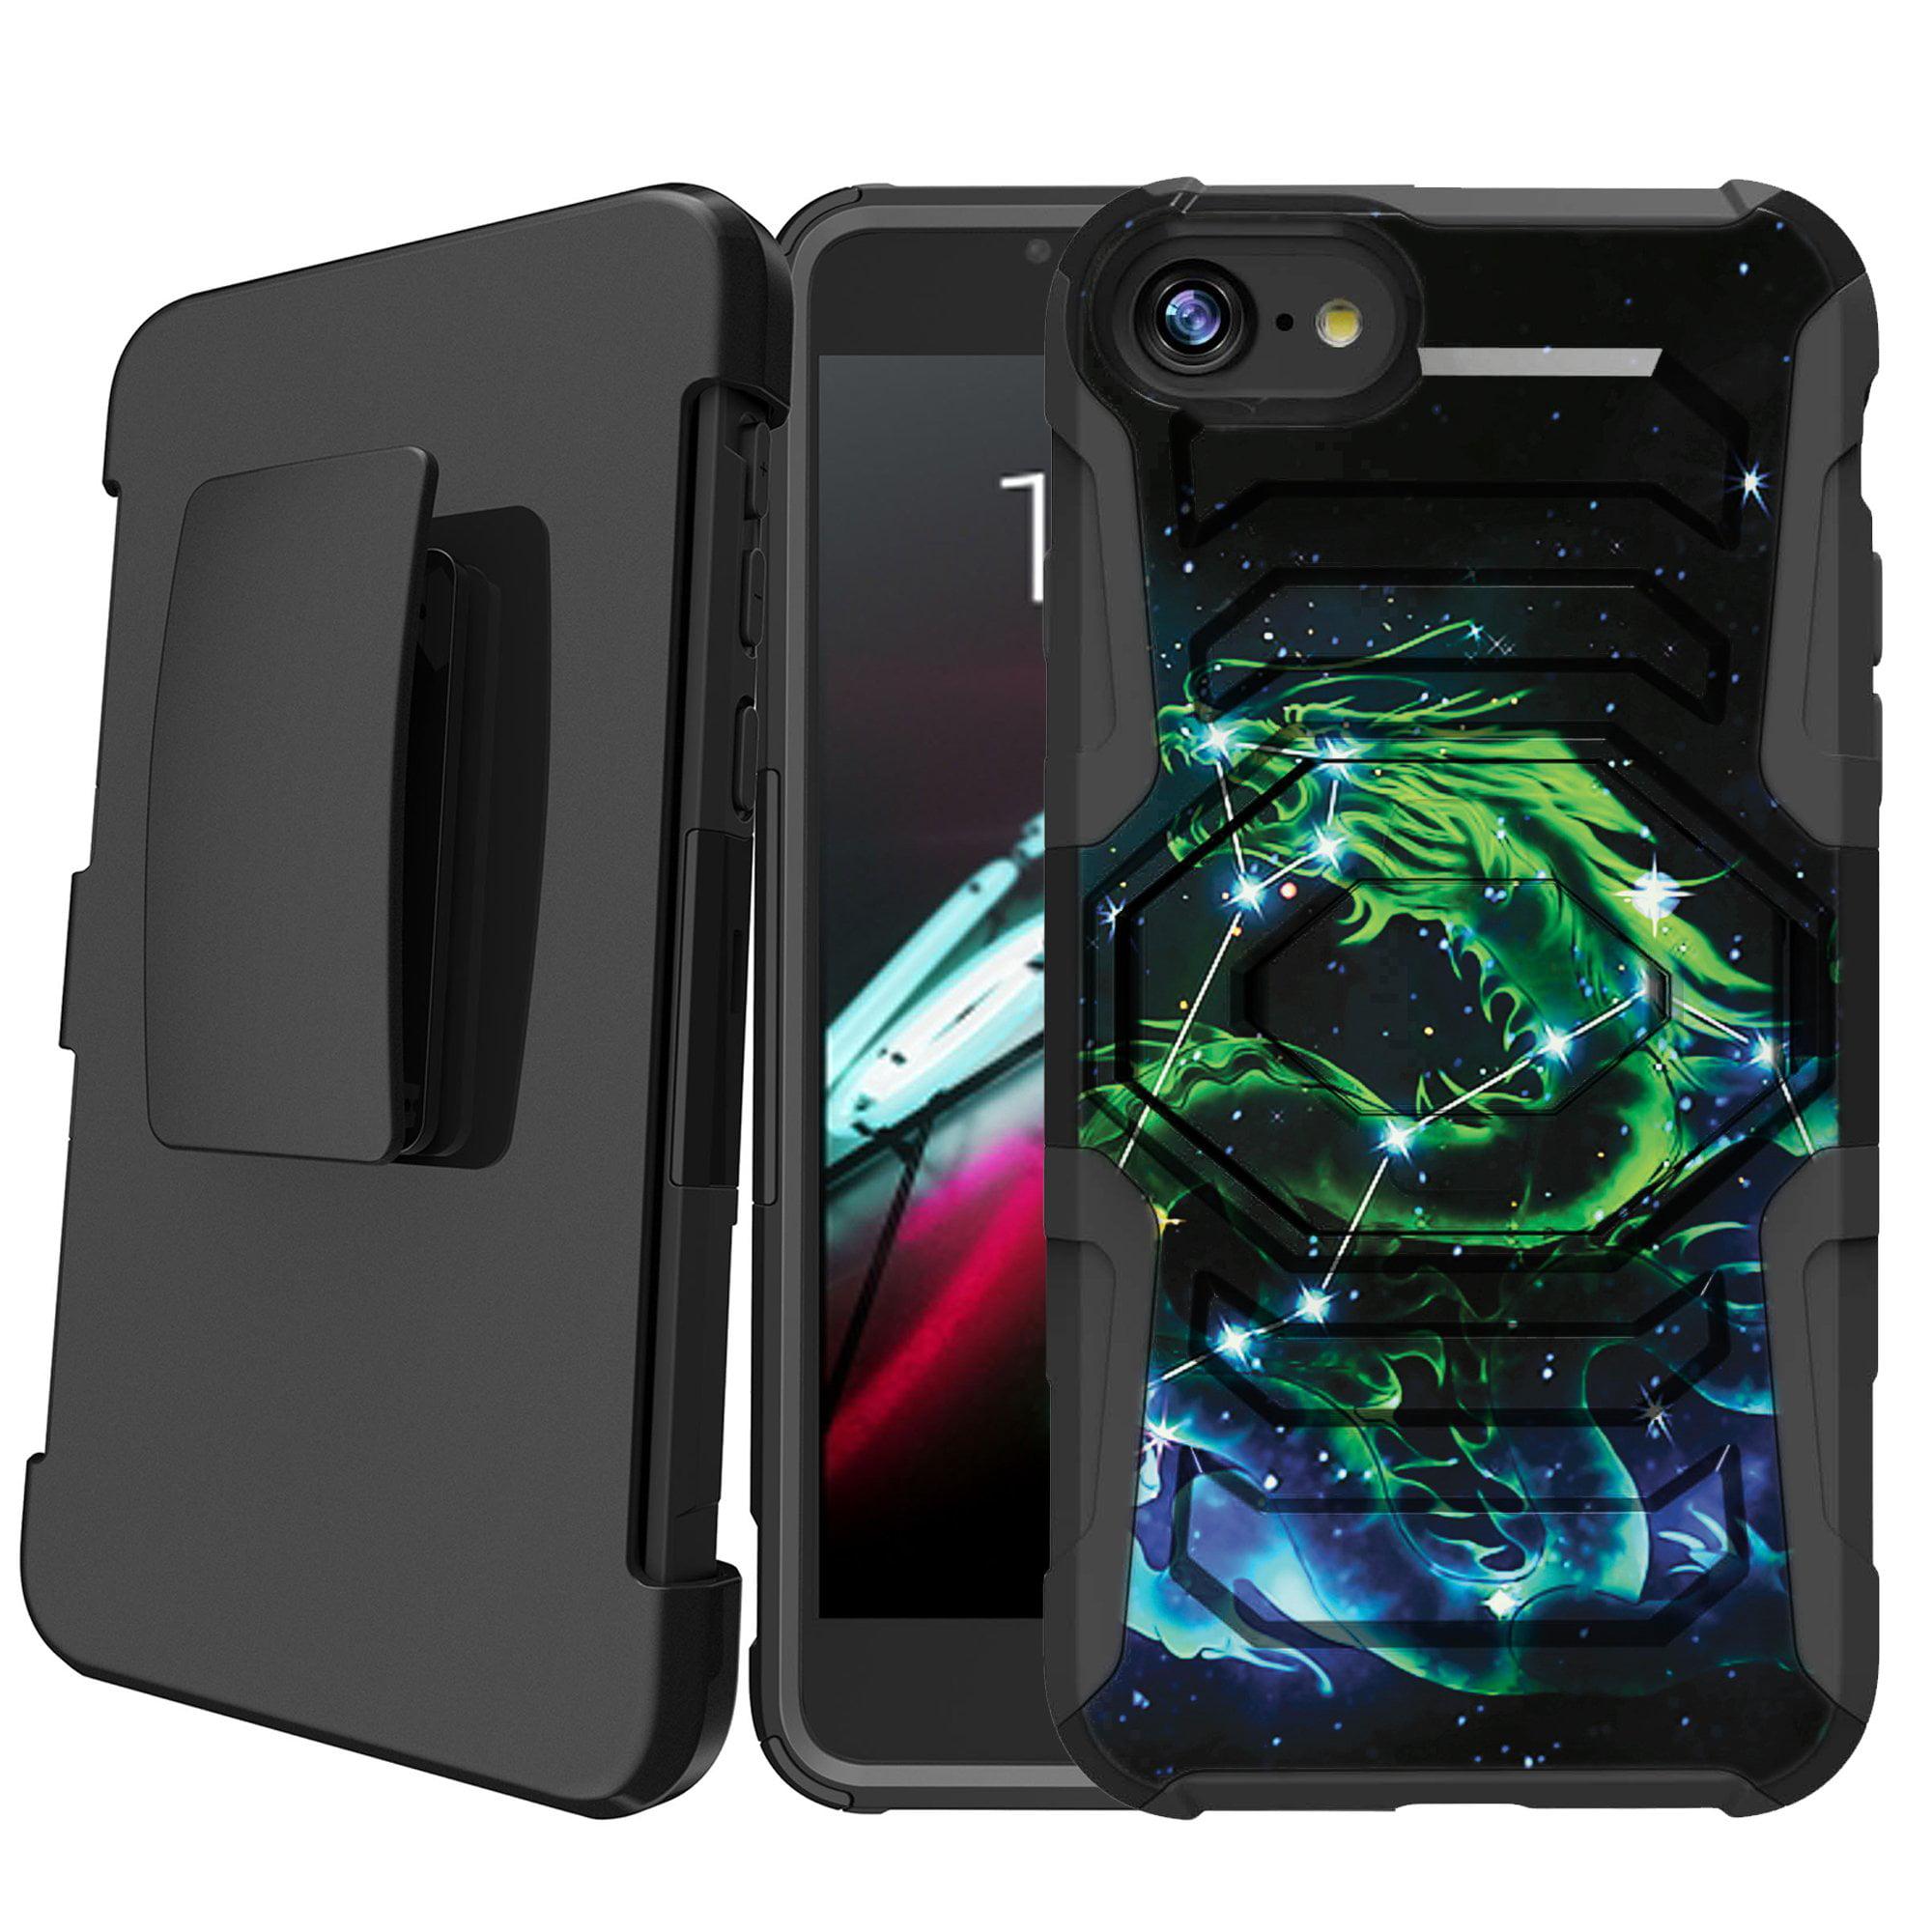 Apple iPhone 8   iPhone 8 2017 Holster Case [Galaxy Case][Galactic Design Series] w/ Built-In Kickstand + Bonus HolsterDragon Galaxy